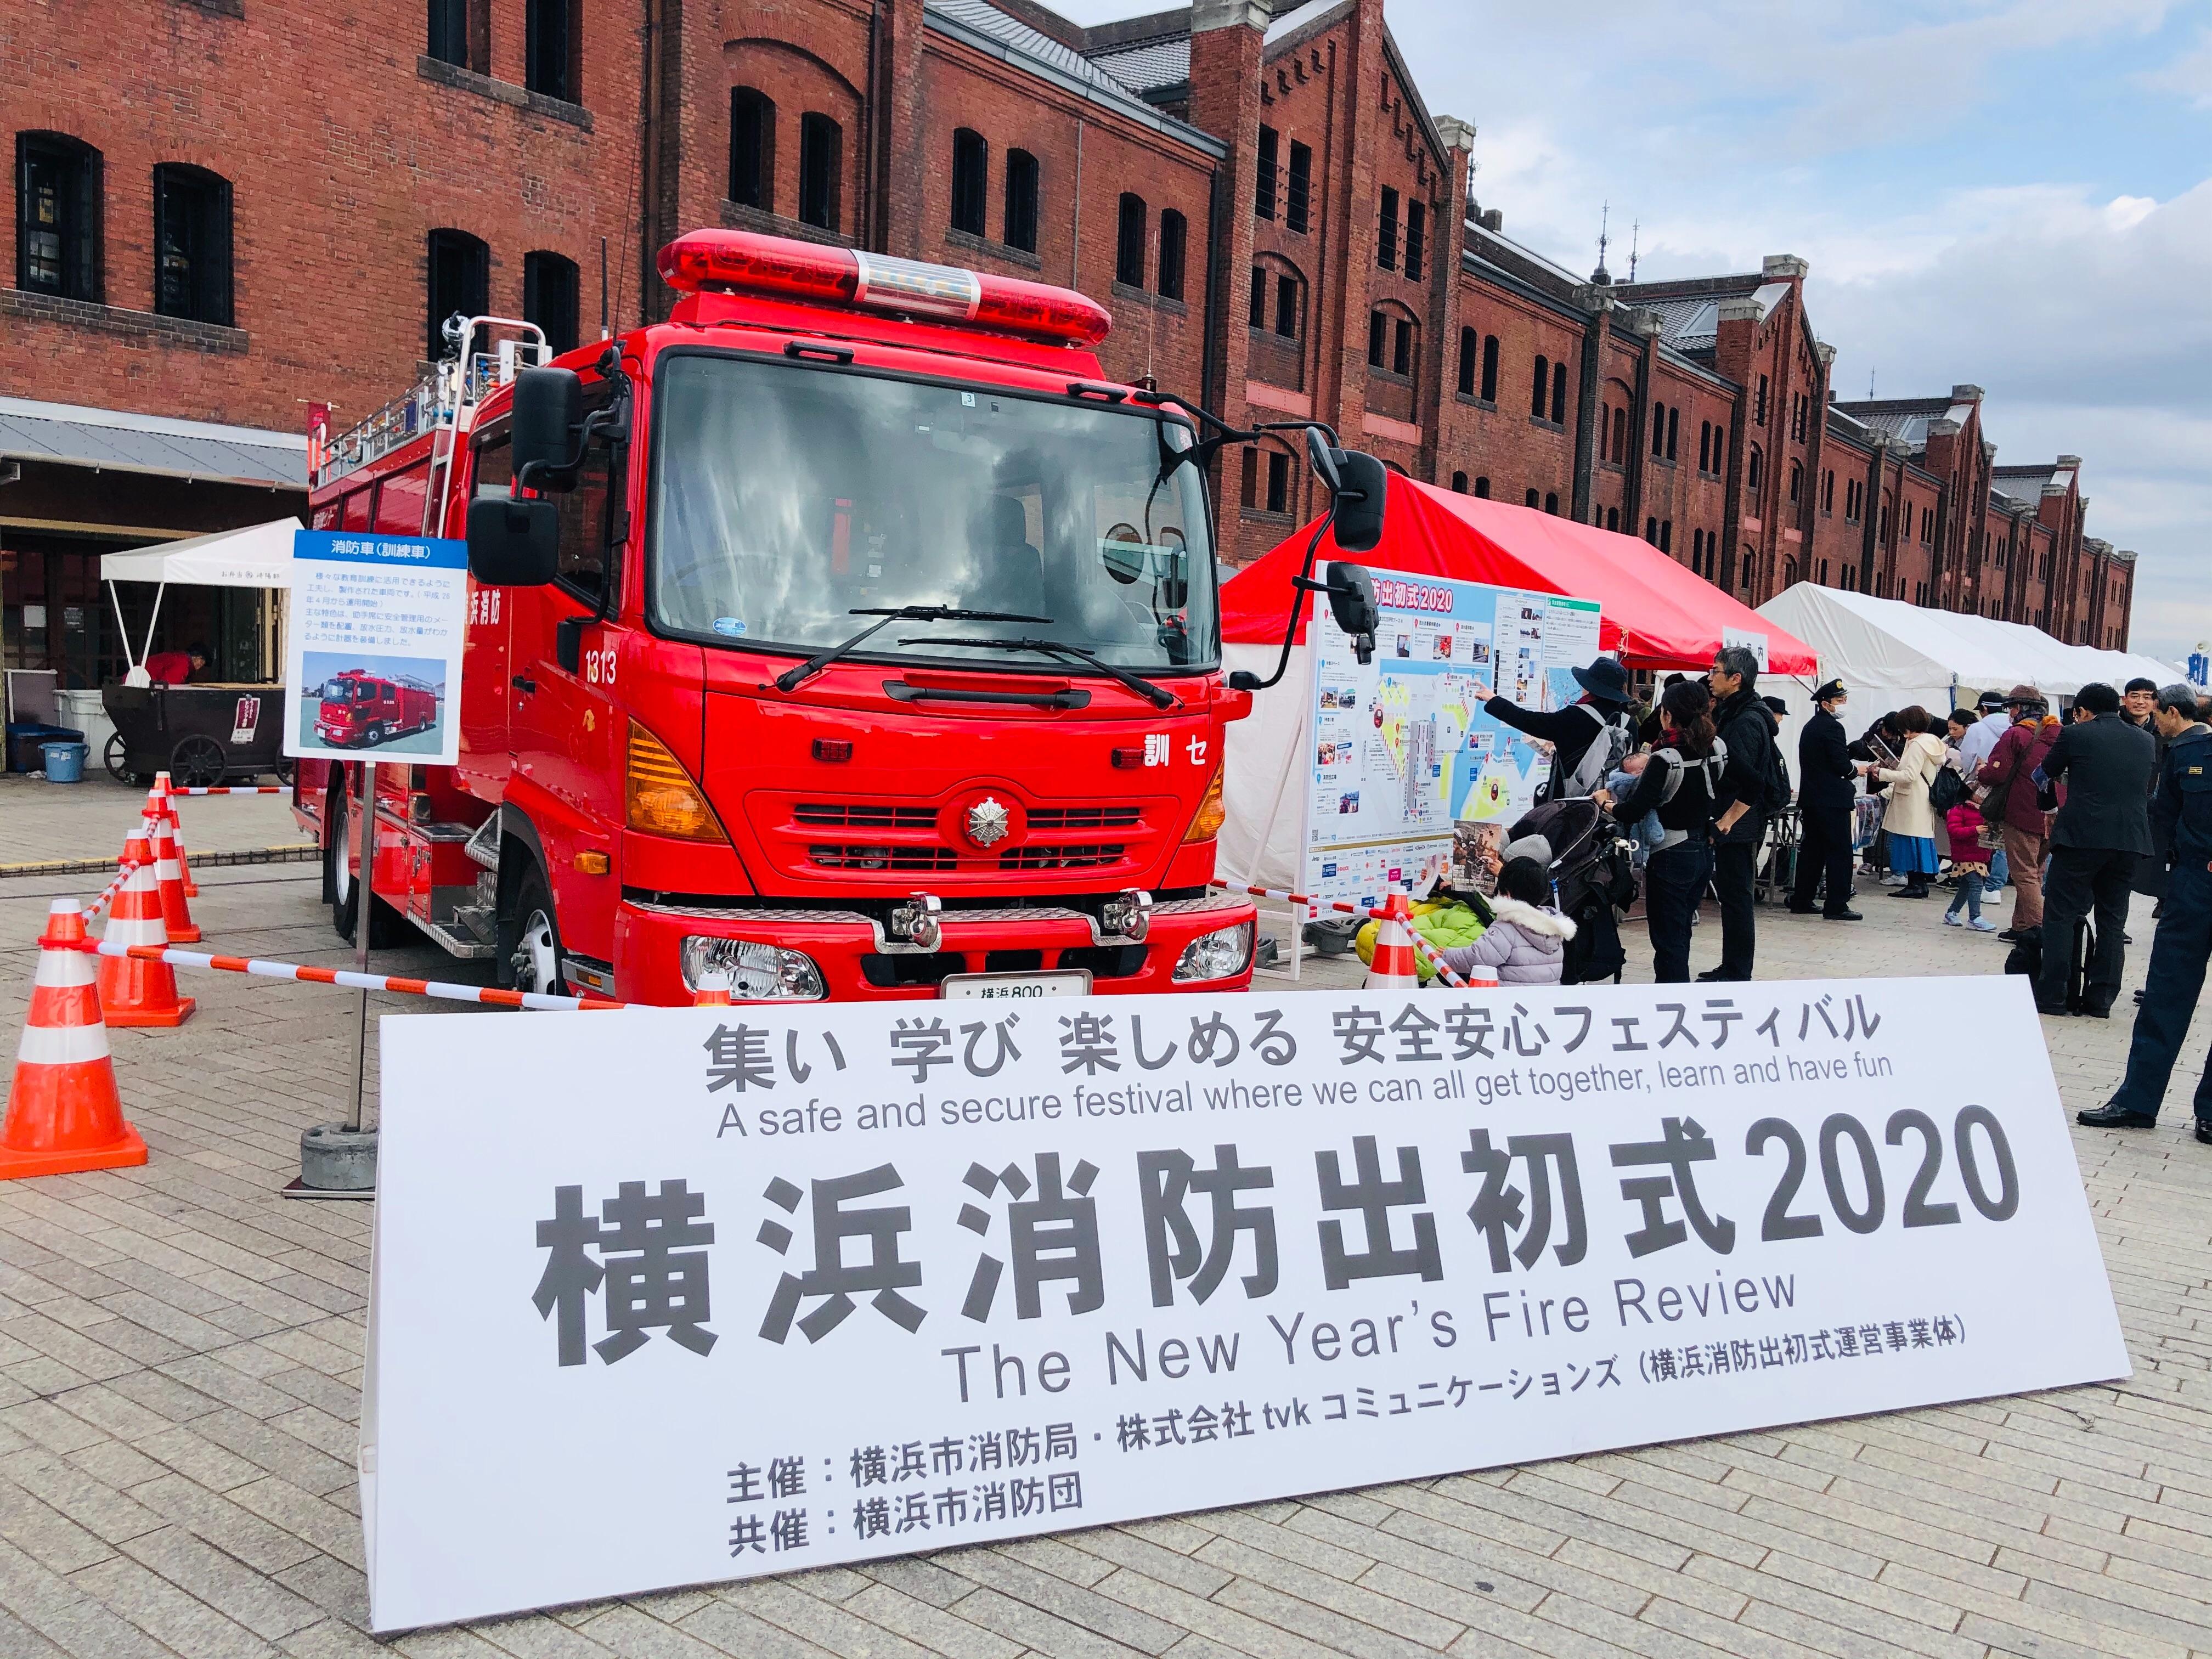 f:id:norimono-chiiku:20200115020039j:image